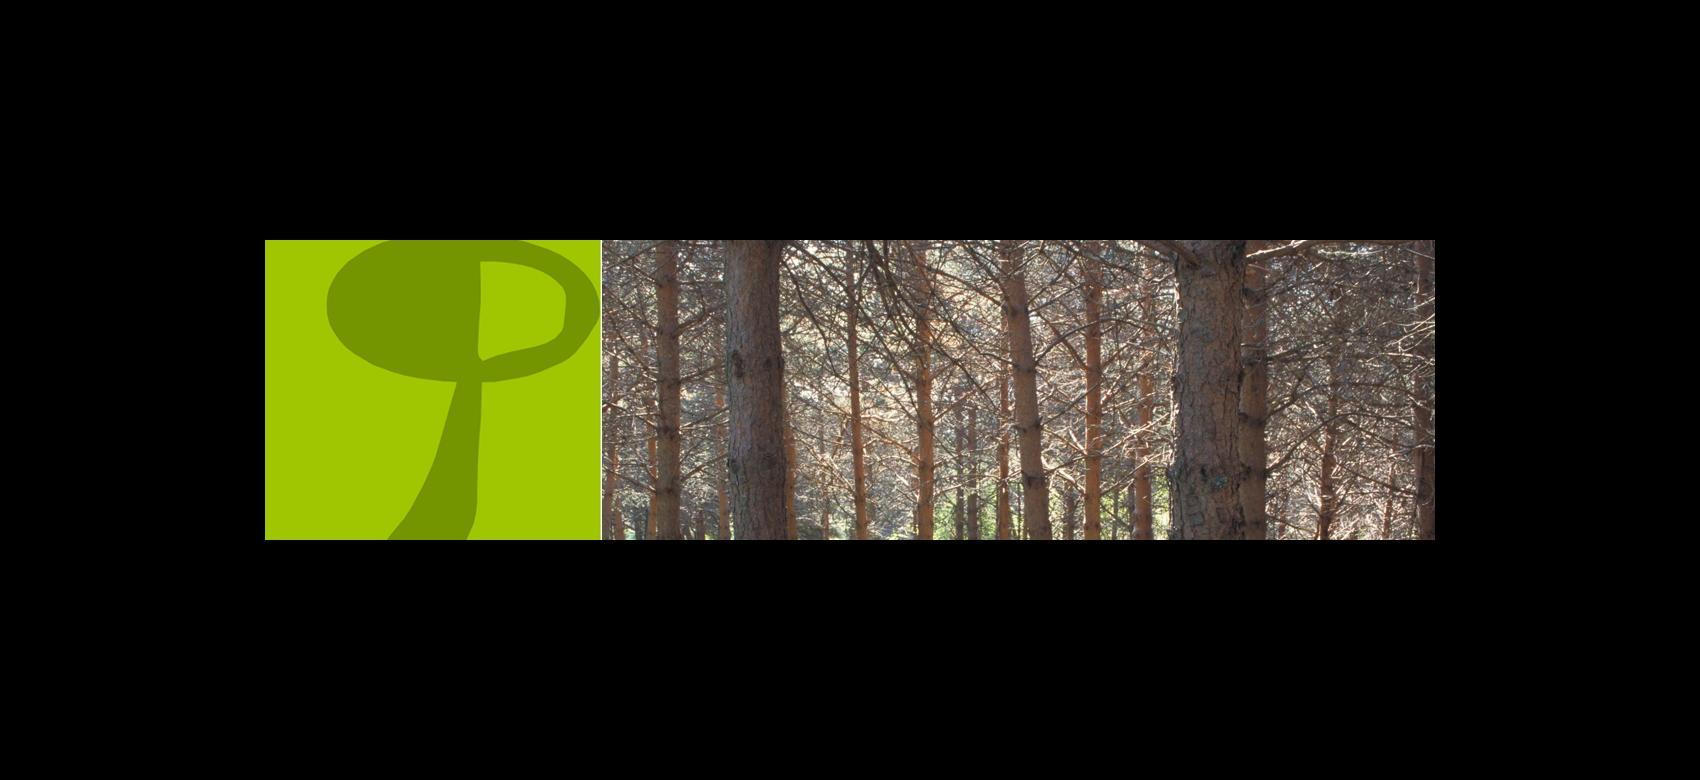 Imagen de pinos silvestres